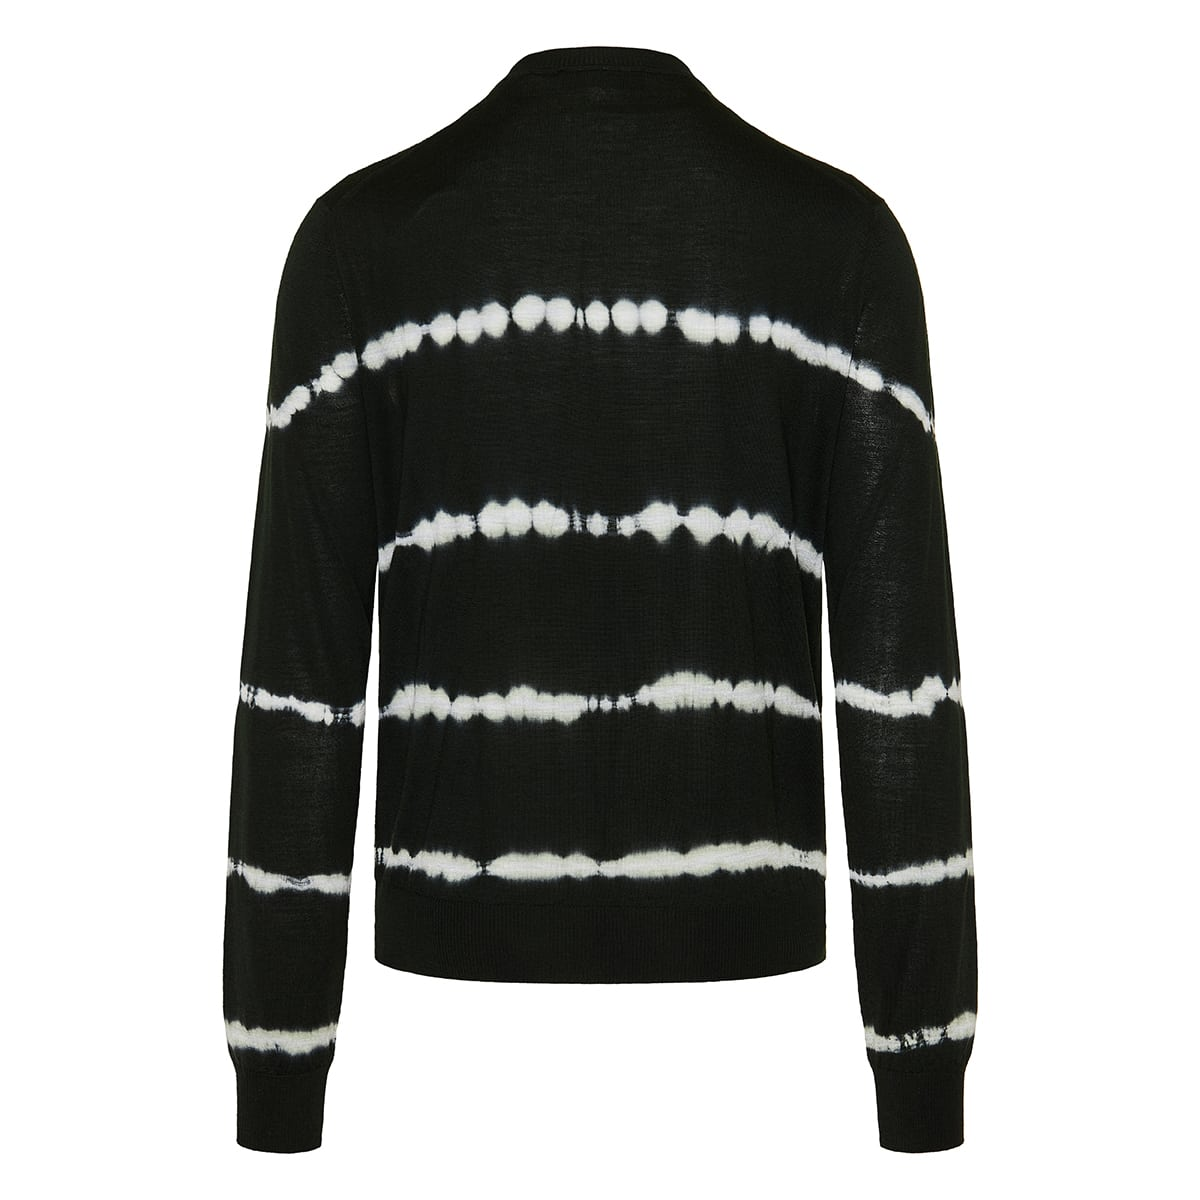 x Federico Curradi Telemaco tie-dye sweater